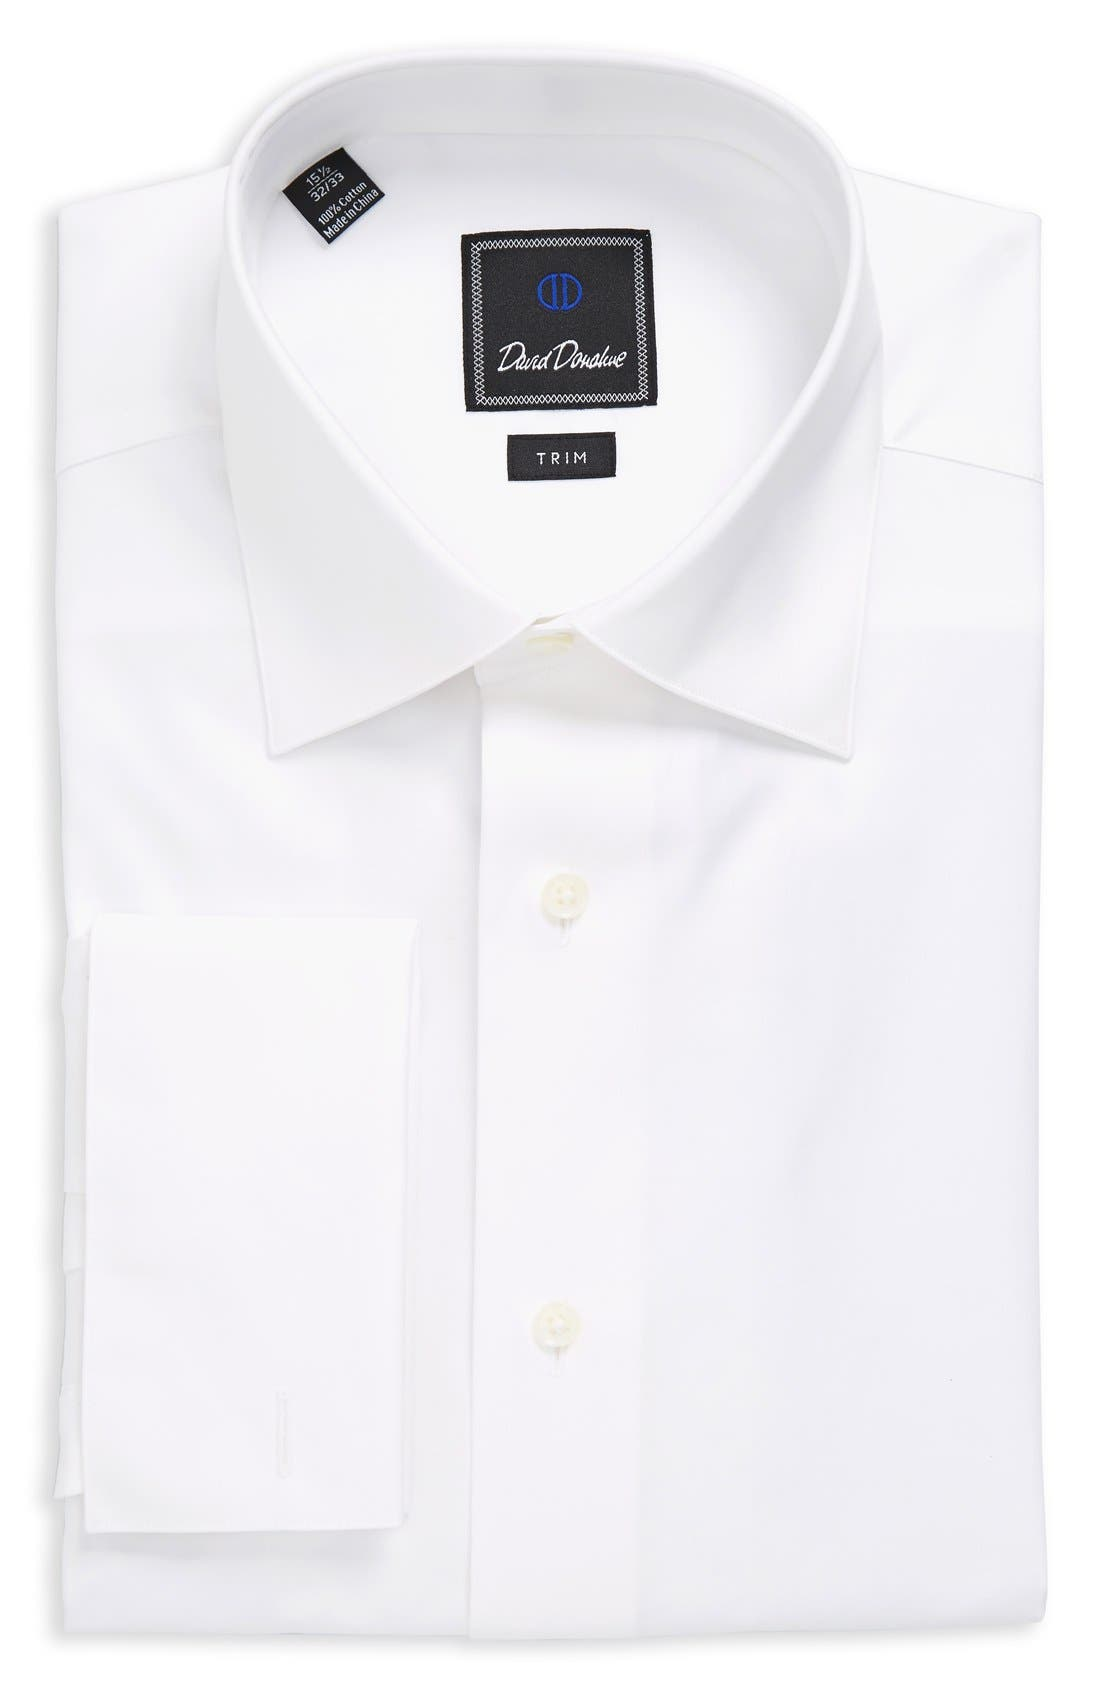 DAVID DONAHUE Trim Fit Tuxedo Shirt